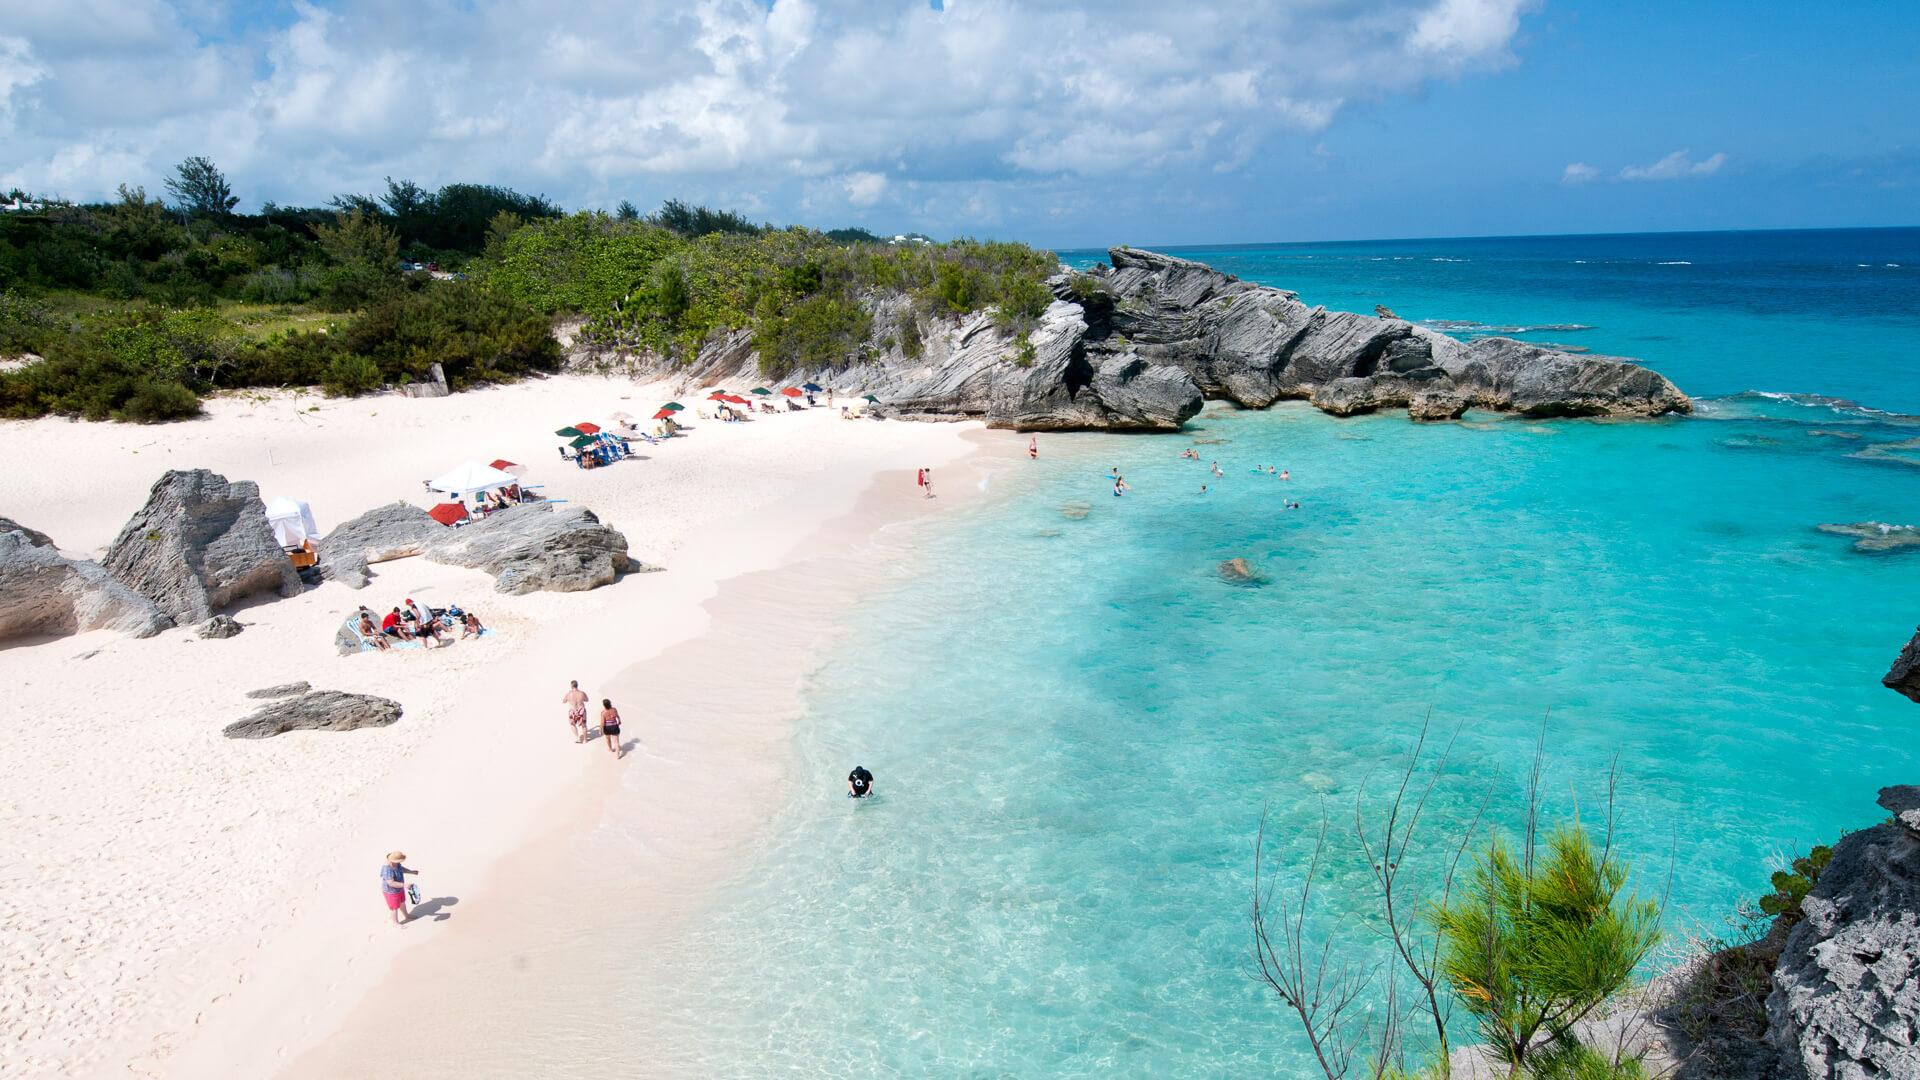 Bermuda is located in the North Atlantic Ocean.